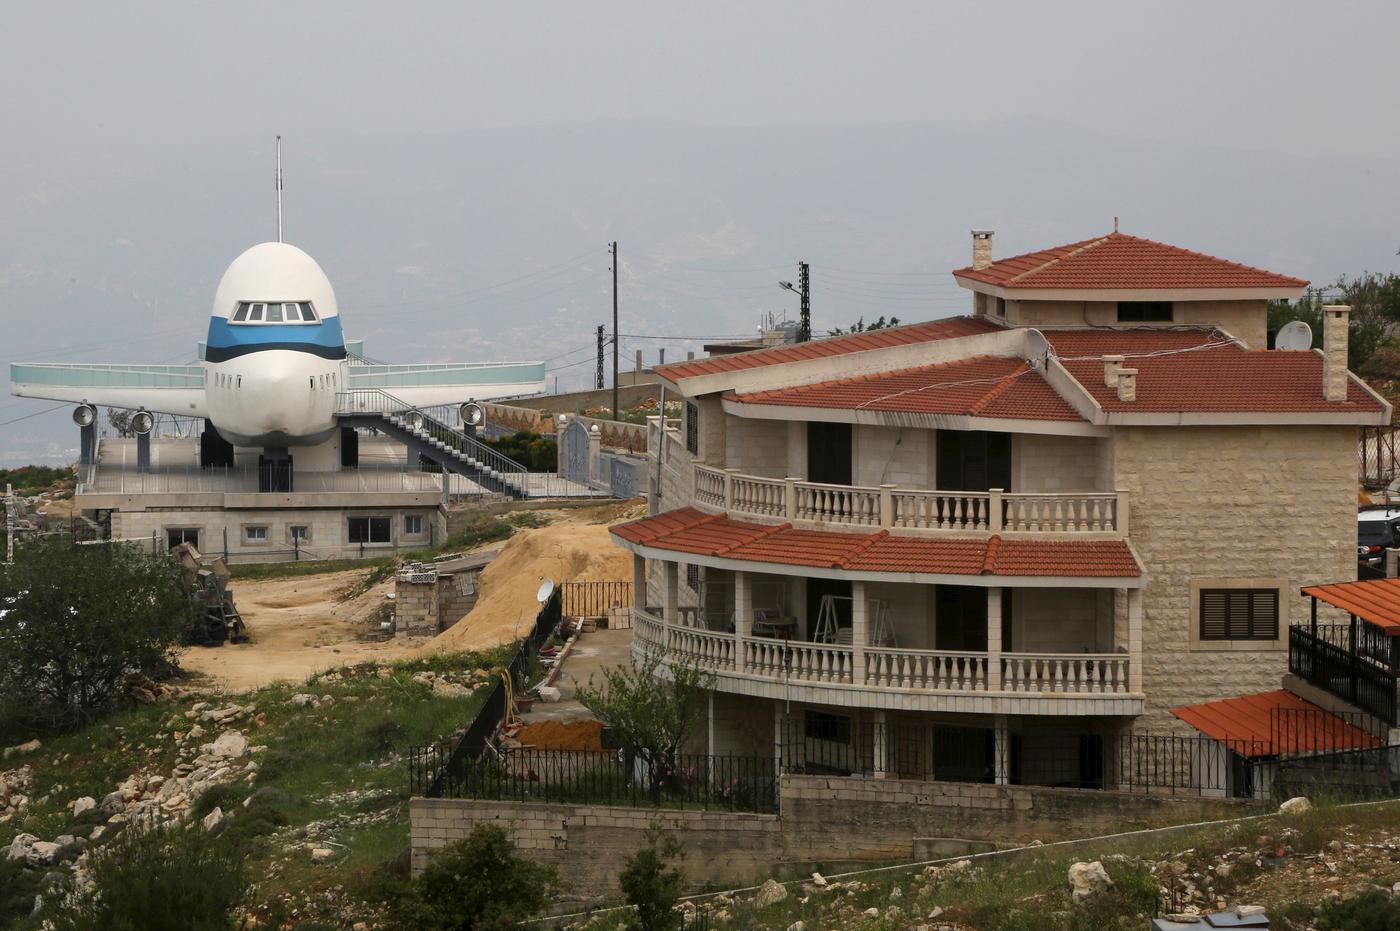 airplane-house-3